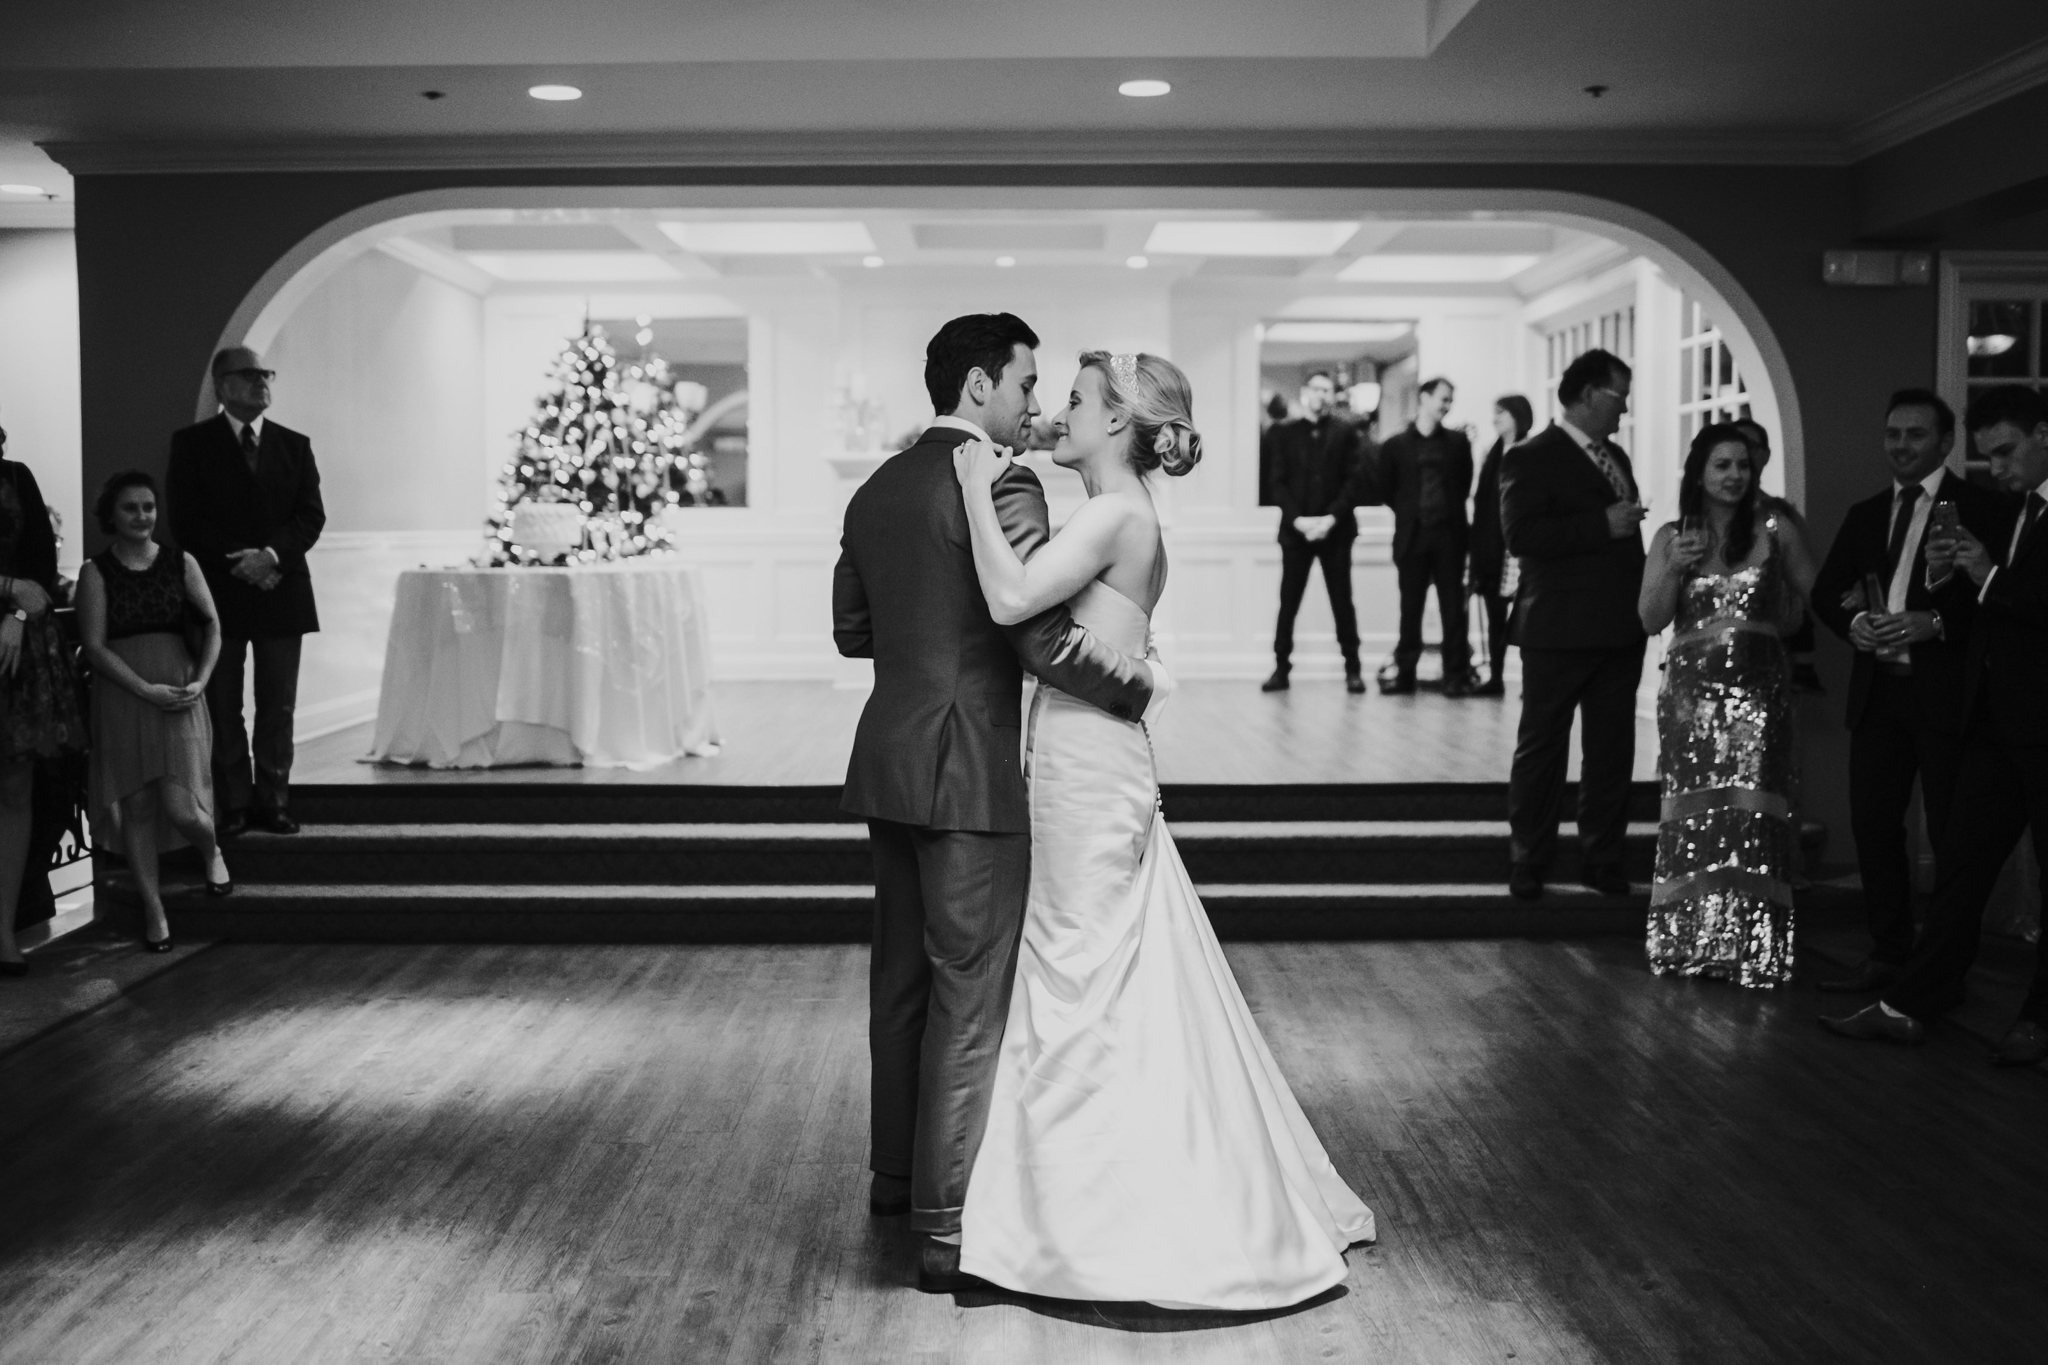 20151230_hussem_wedding_1035_web.jpg